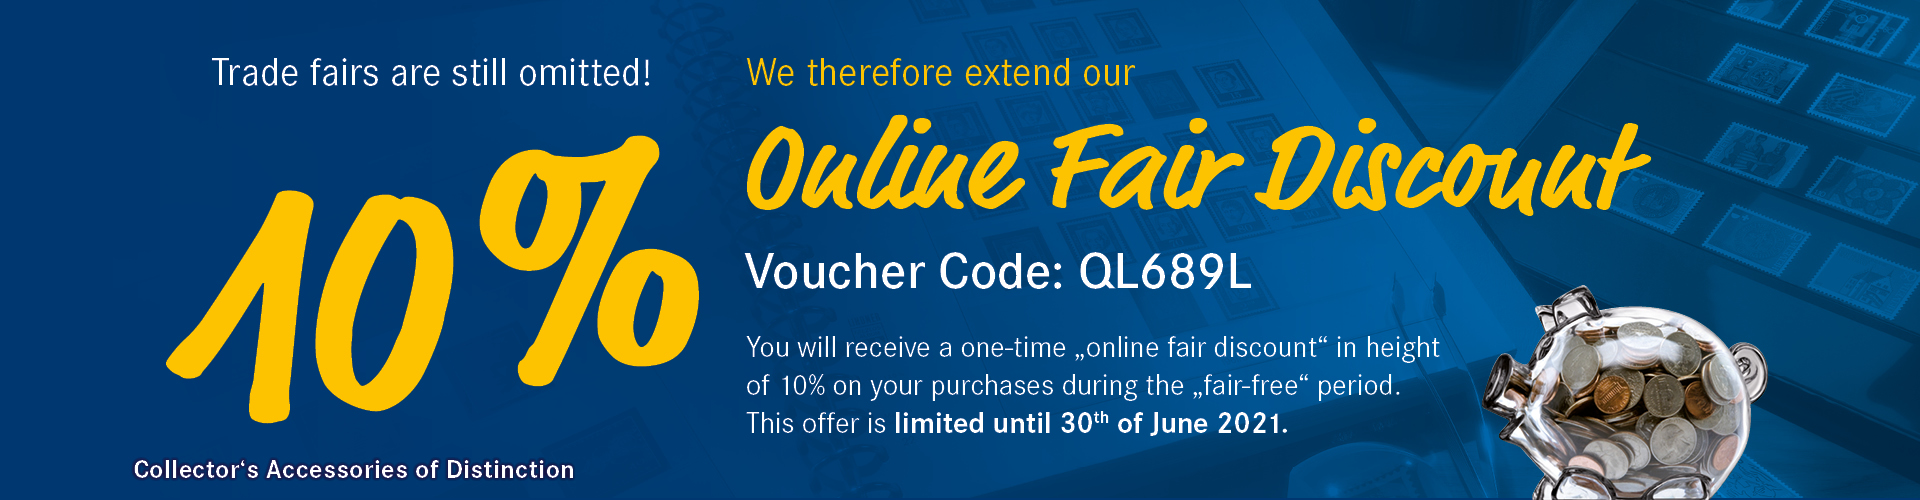 10% Online Fair Discount